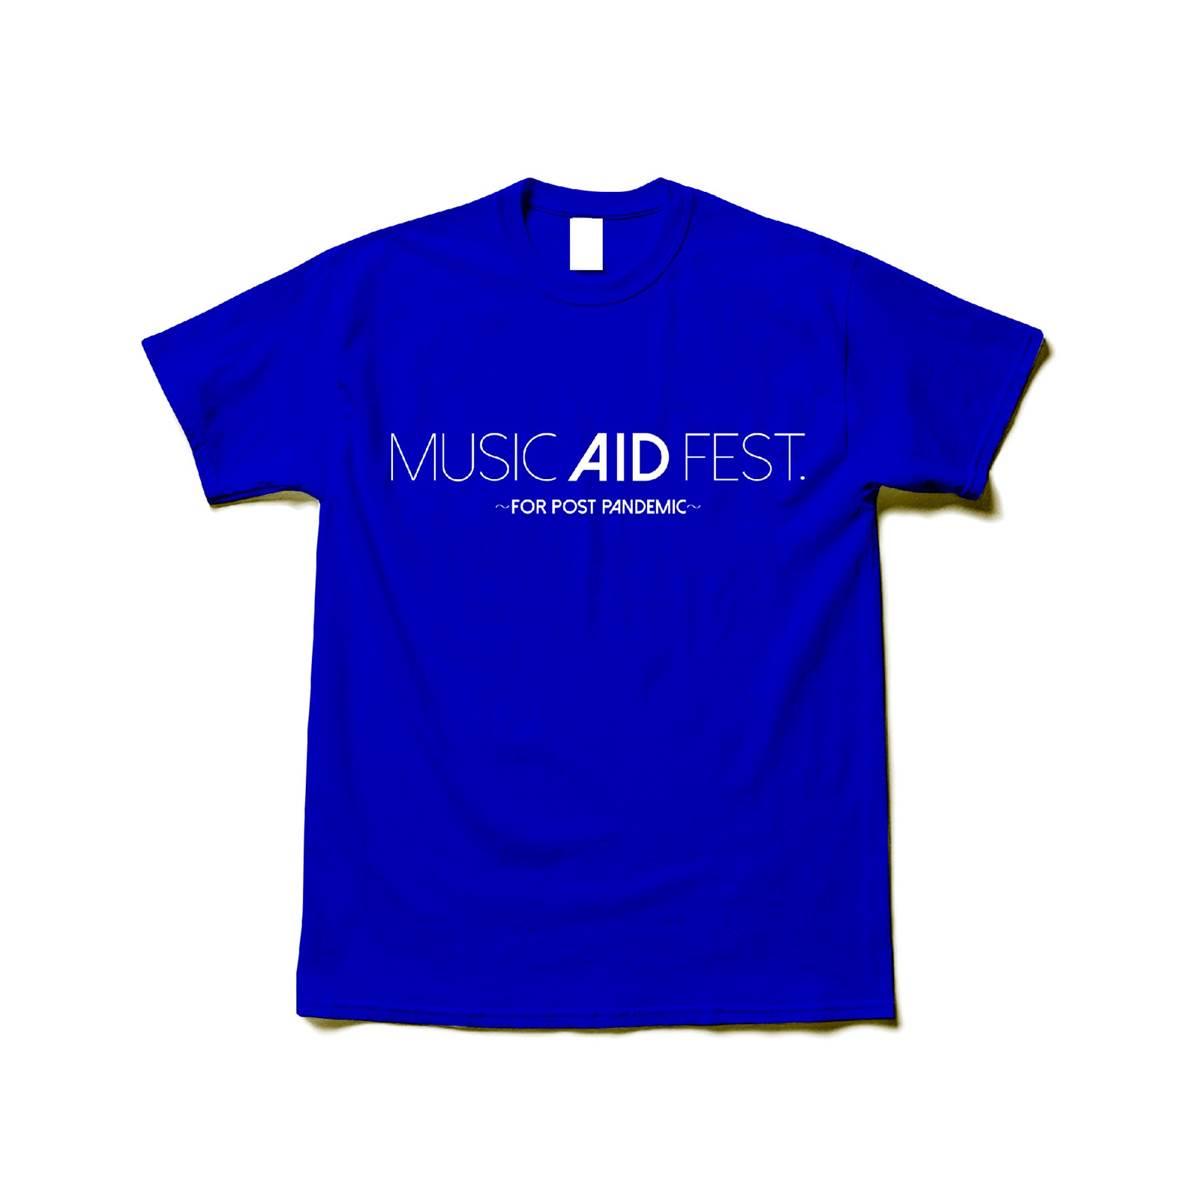 MUSIC AID FEST. Tシャツ (青)